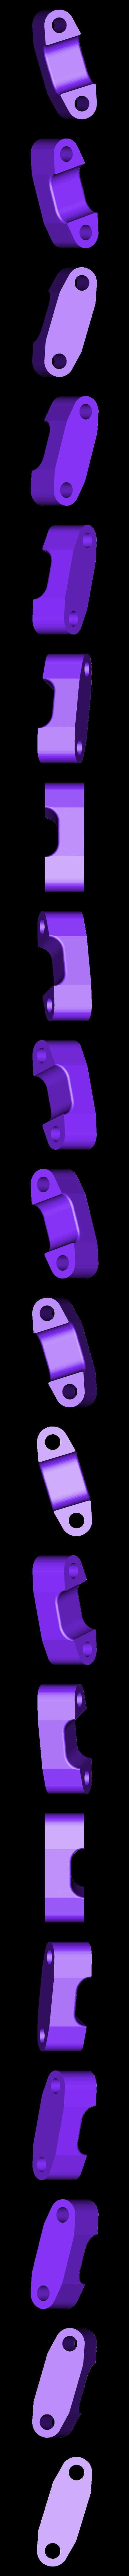 cable_stopper.stl Download free STL file Levetating Plant Pot • 3D print design, MakerMind